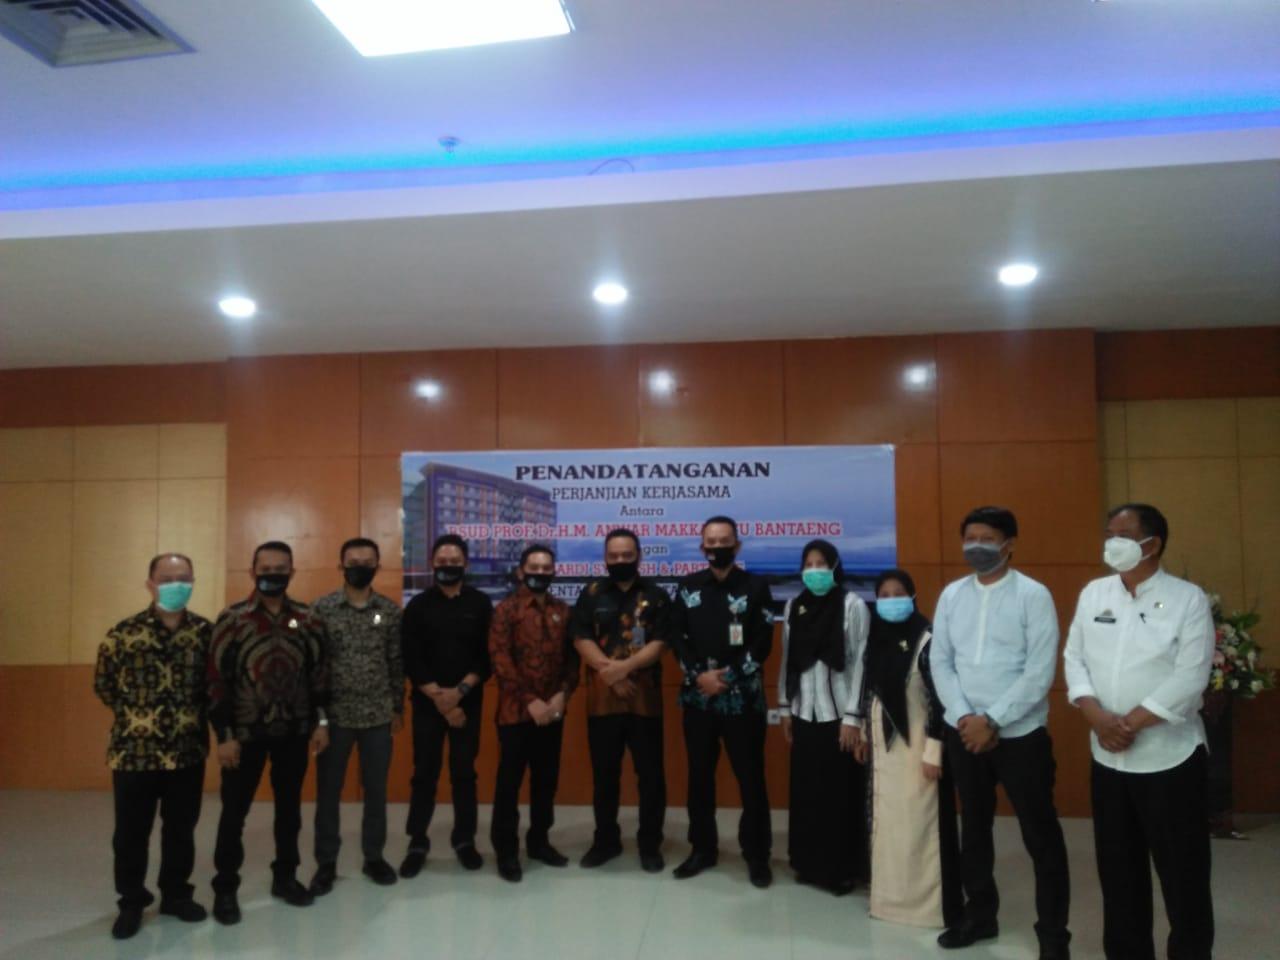 Suardi Syam & Partners Resmi Jadi Konsultan Hukum RSUD Bantaeng